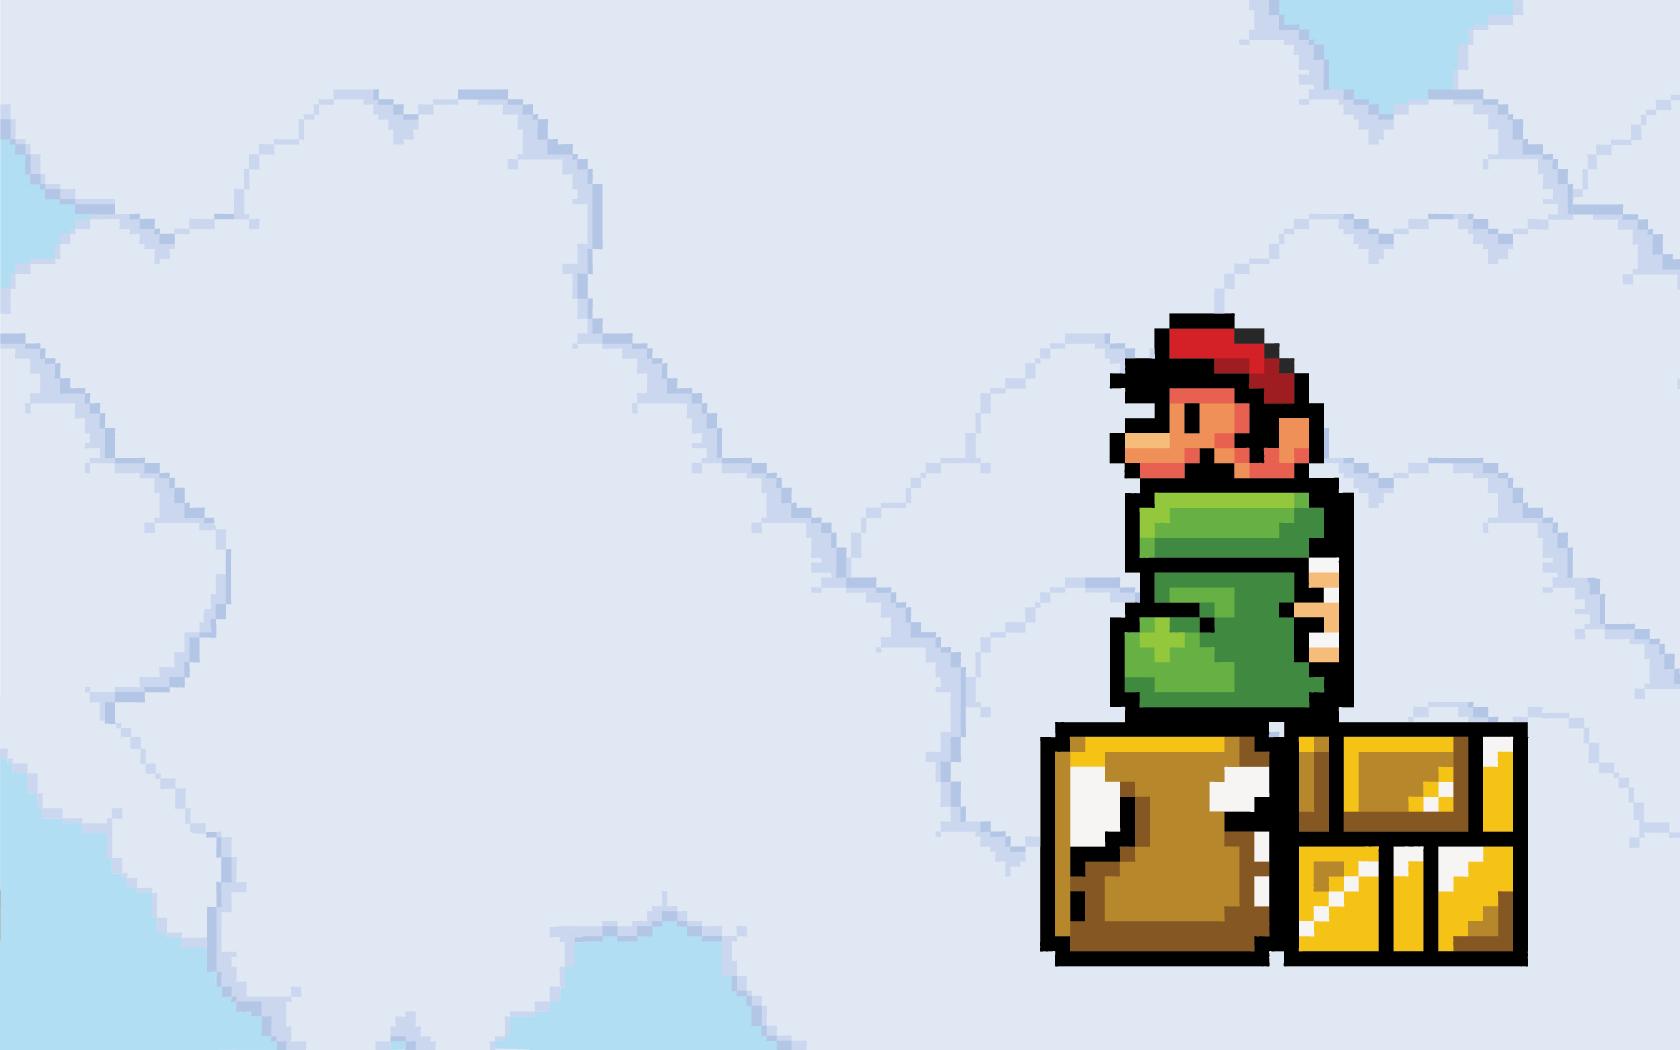 Mario Bros 3 Background